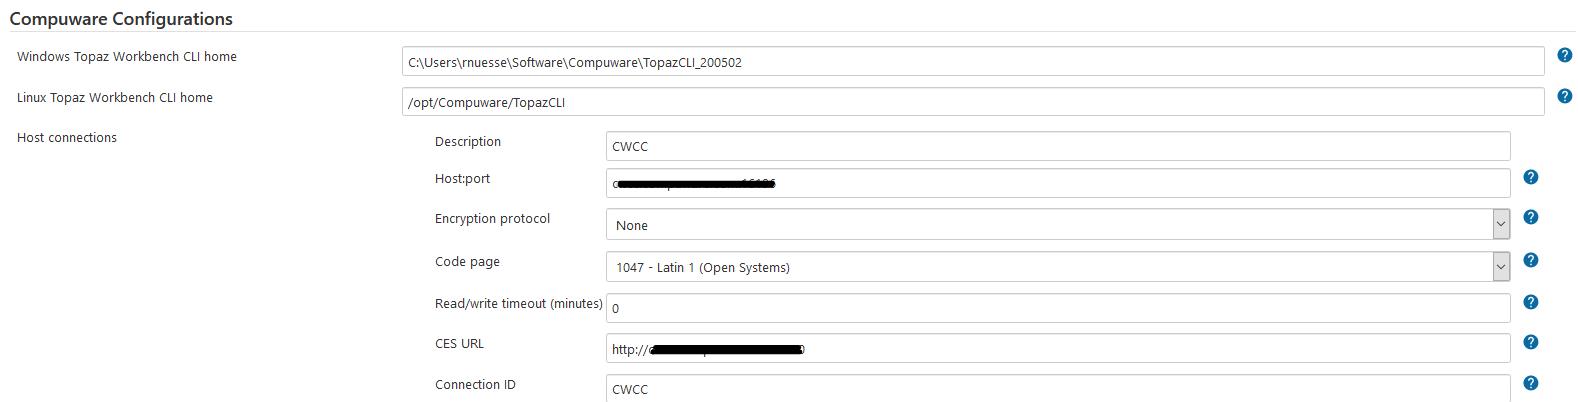 Compuware configuration